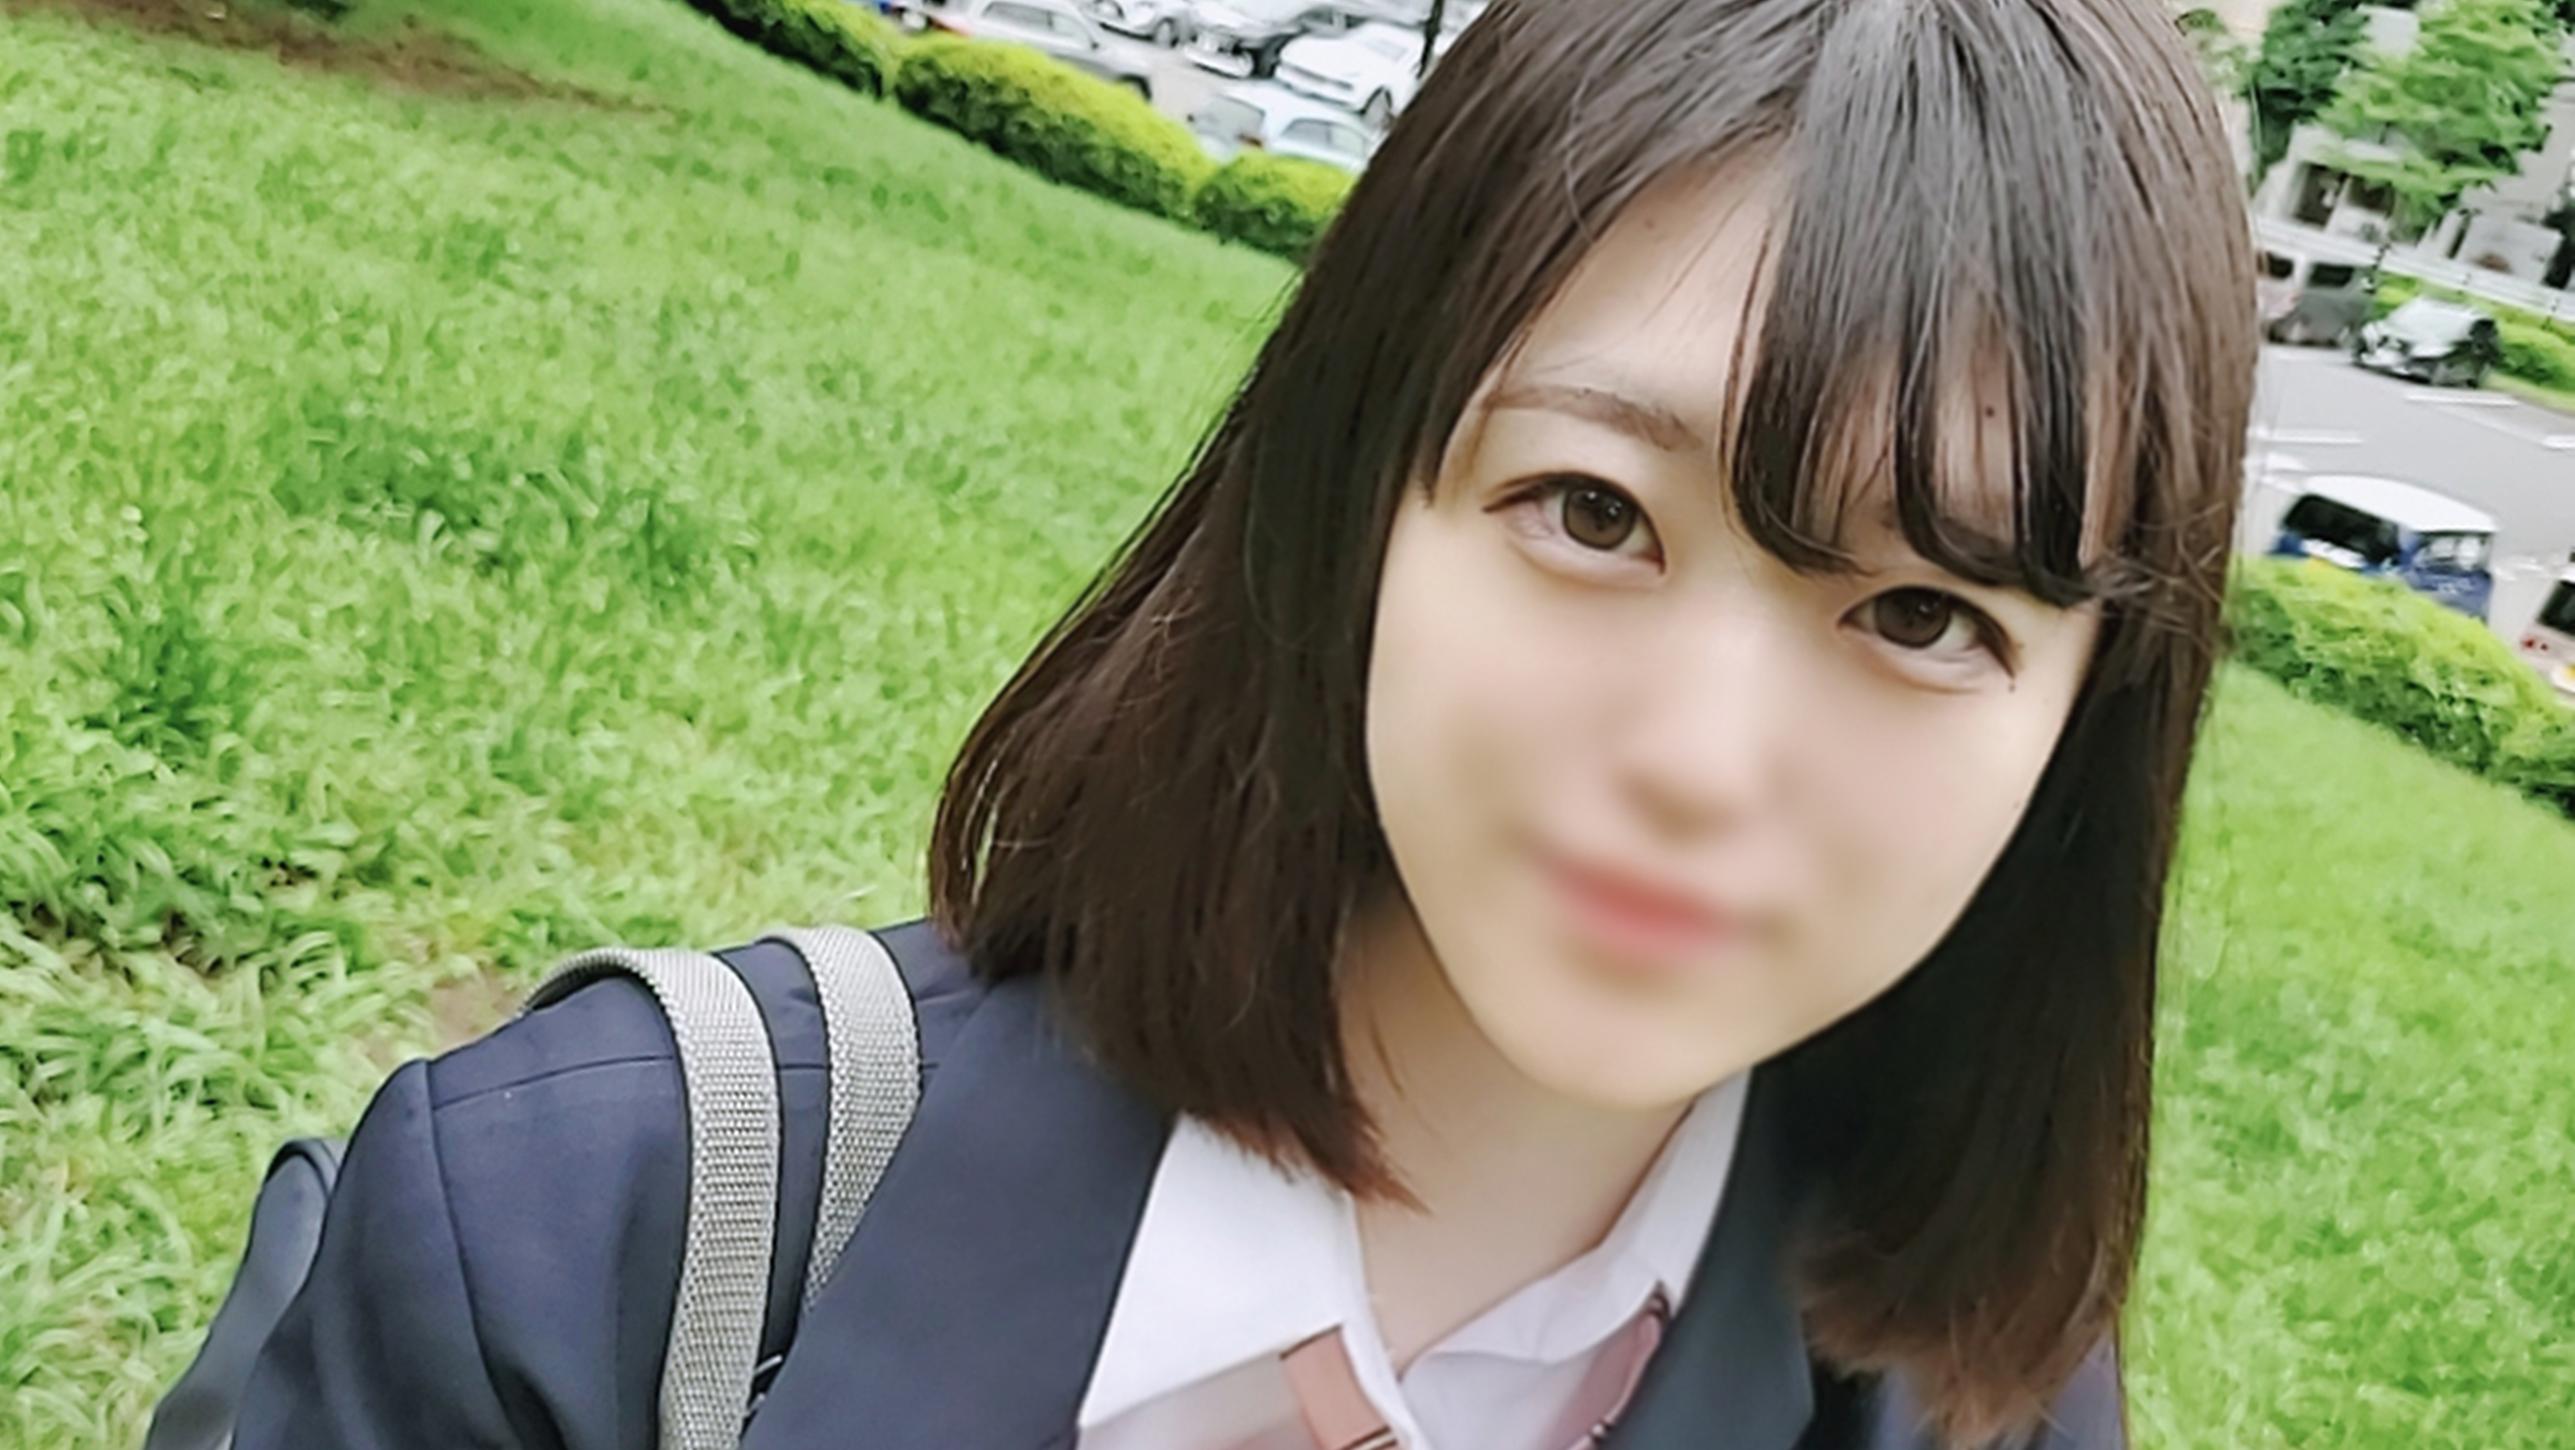 FC2PPV 2232170 顔出し!!個数限定!【無修正】チア部所属のEcup美少女に淫行中出し!!